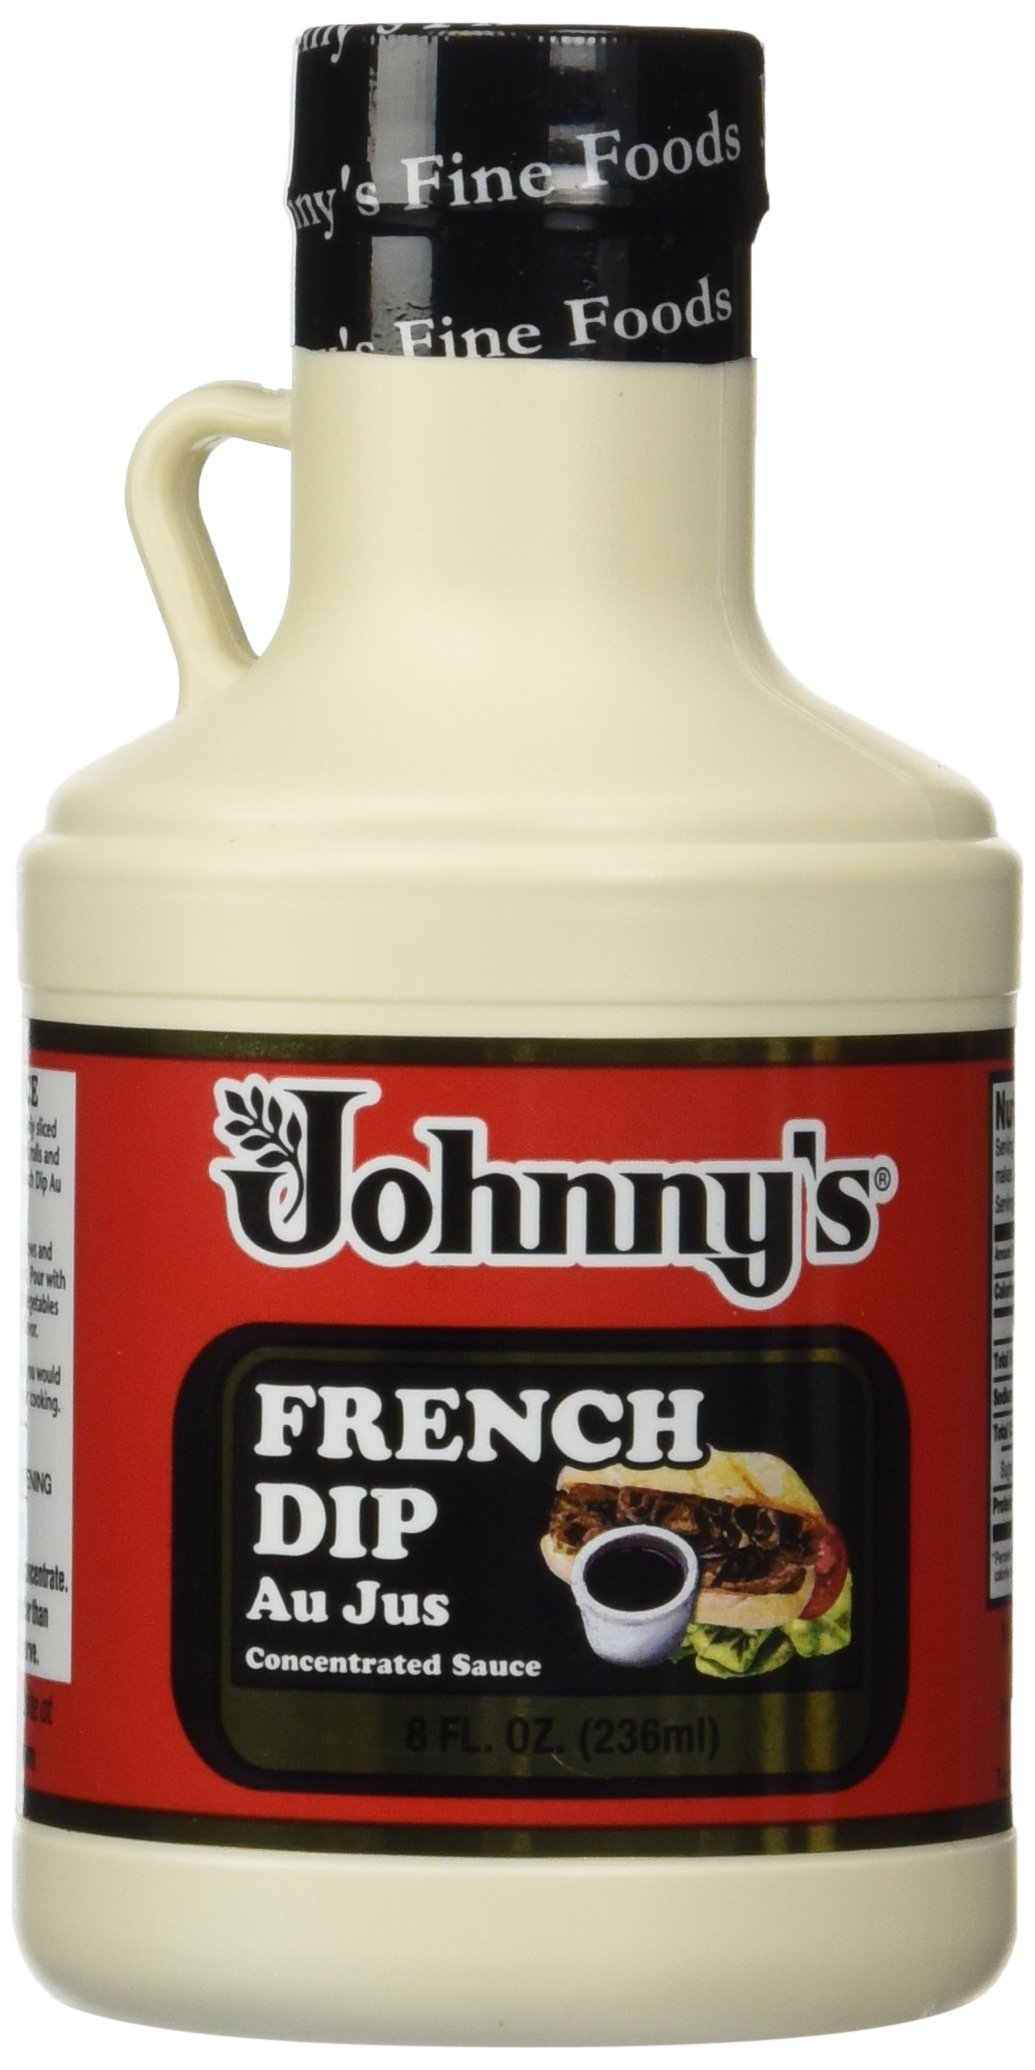 Johnnys Fine Foods Au Jus Frnch Dip, 8 Fl Oz, Pack of 2